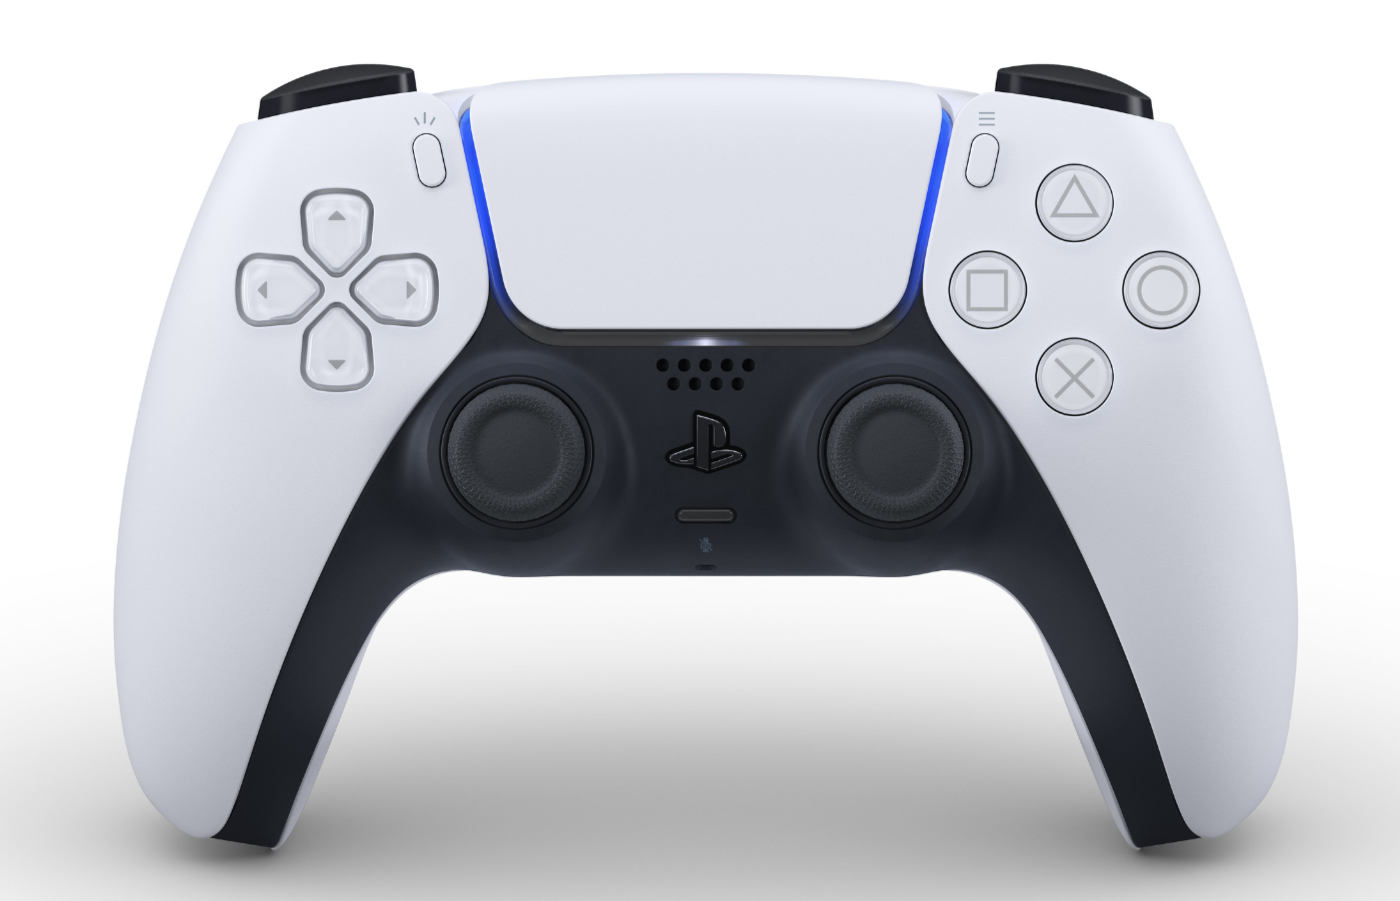 PS5のコントローラーDualSense公開、白カラーにXboxライクな形状